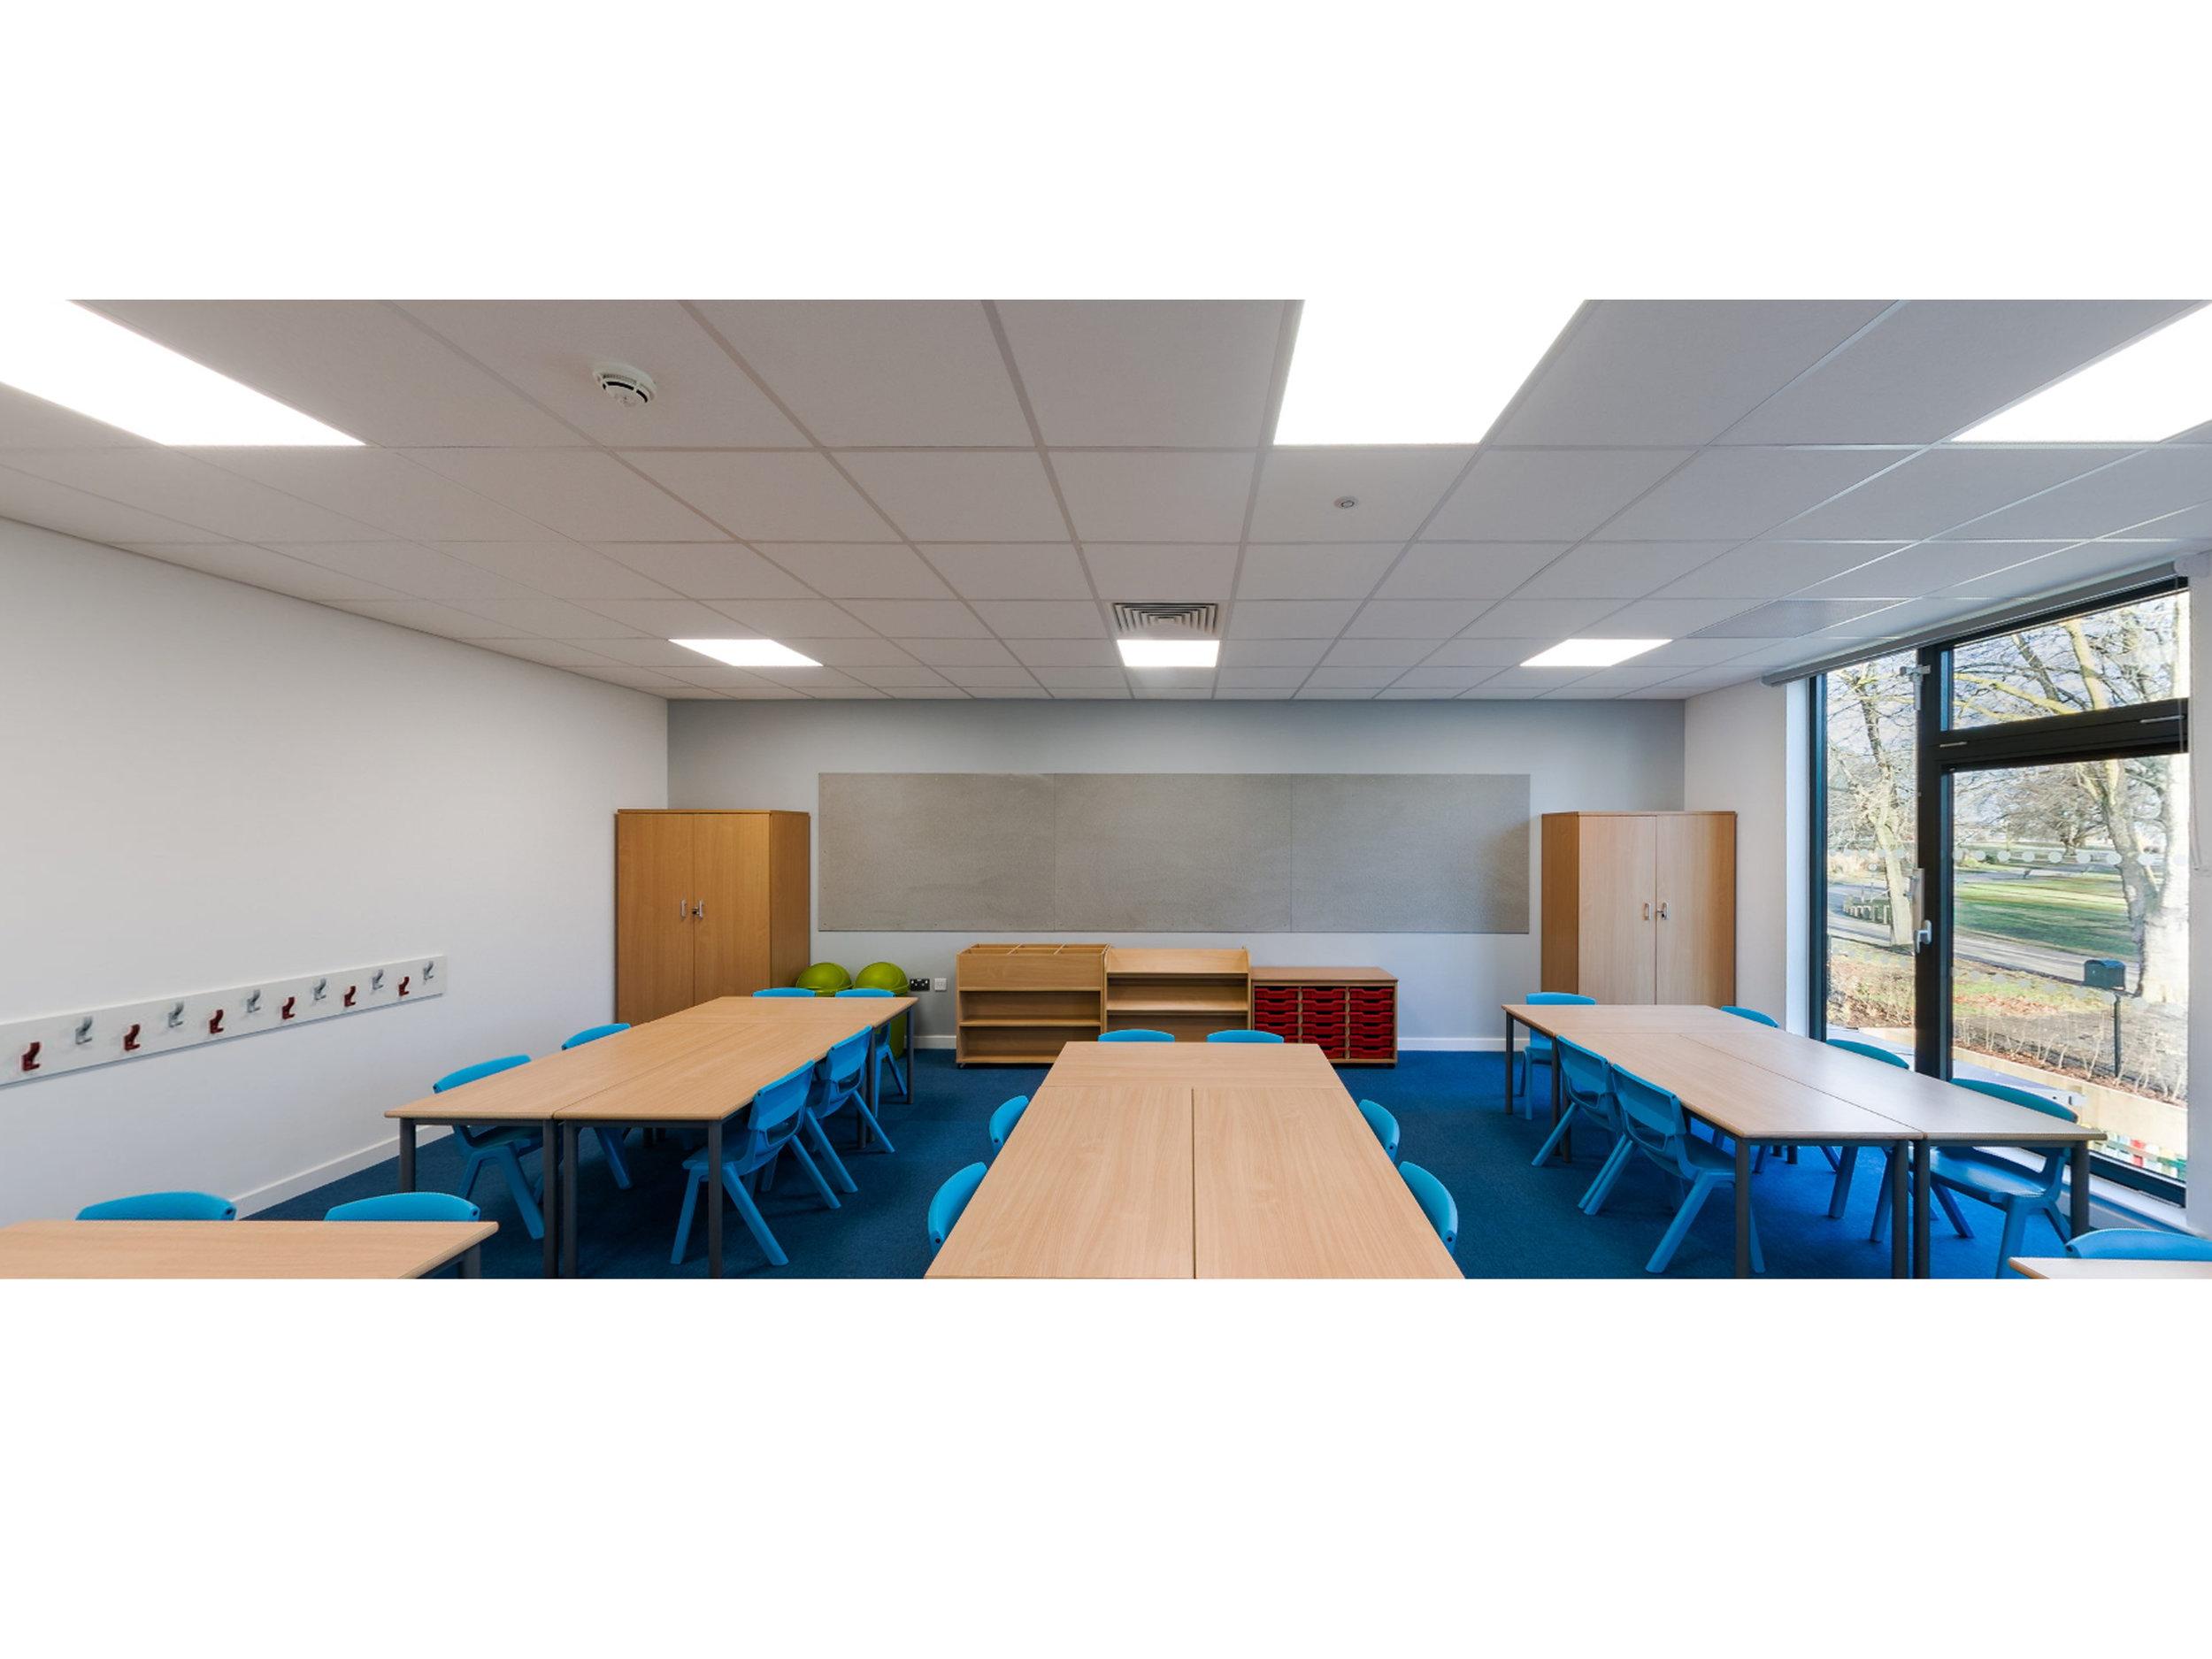 Classroom_2.jpg